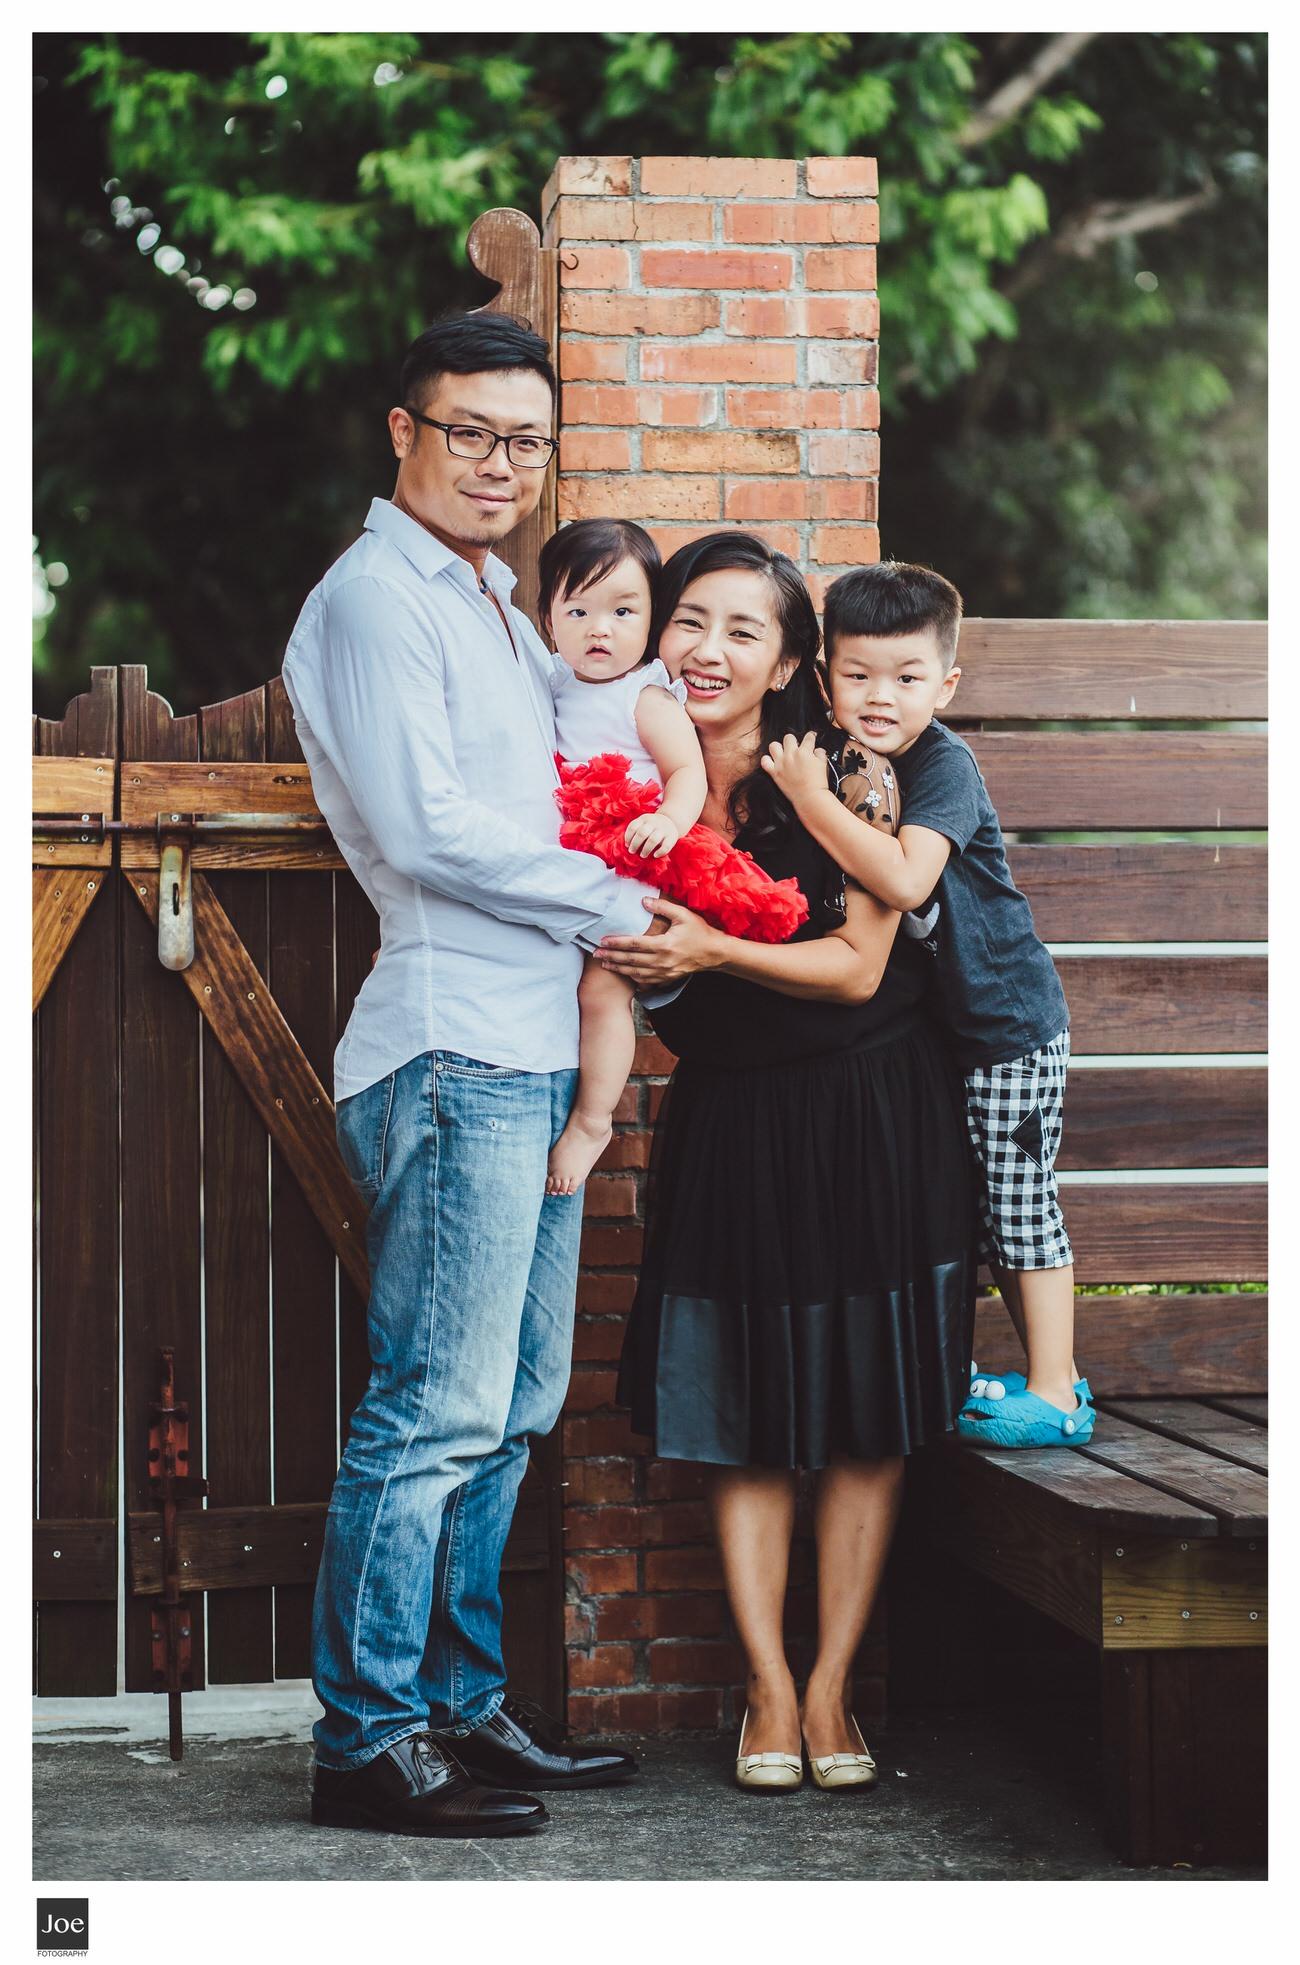 joe-fotography-family-photo-pepper-salt-bowtie-026.jpg